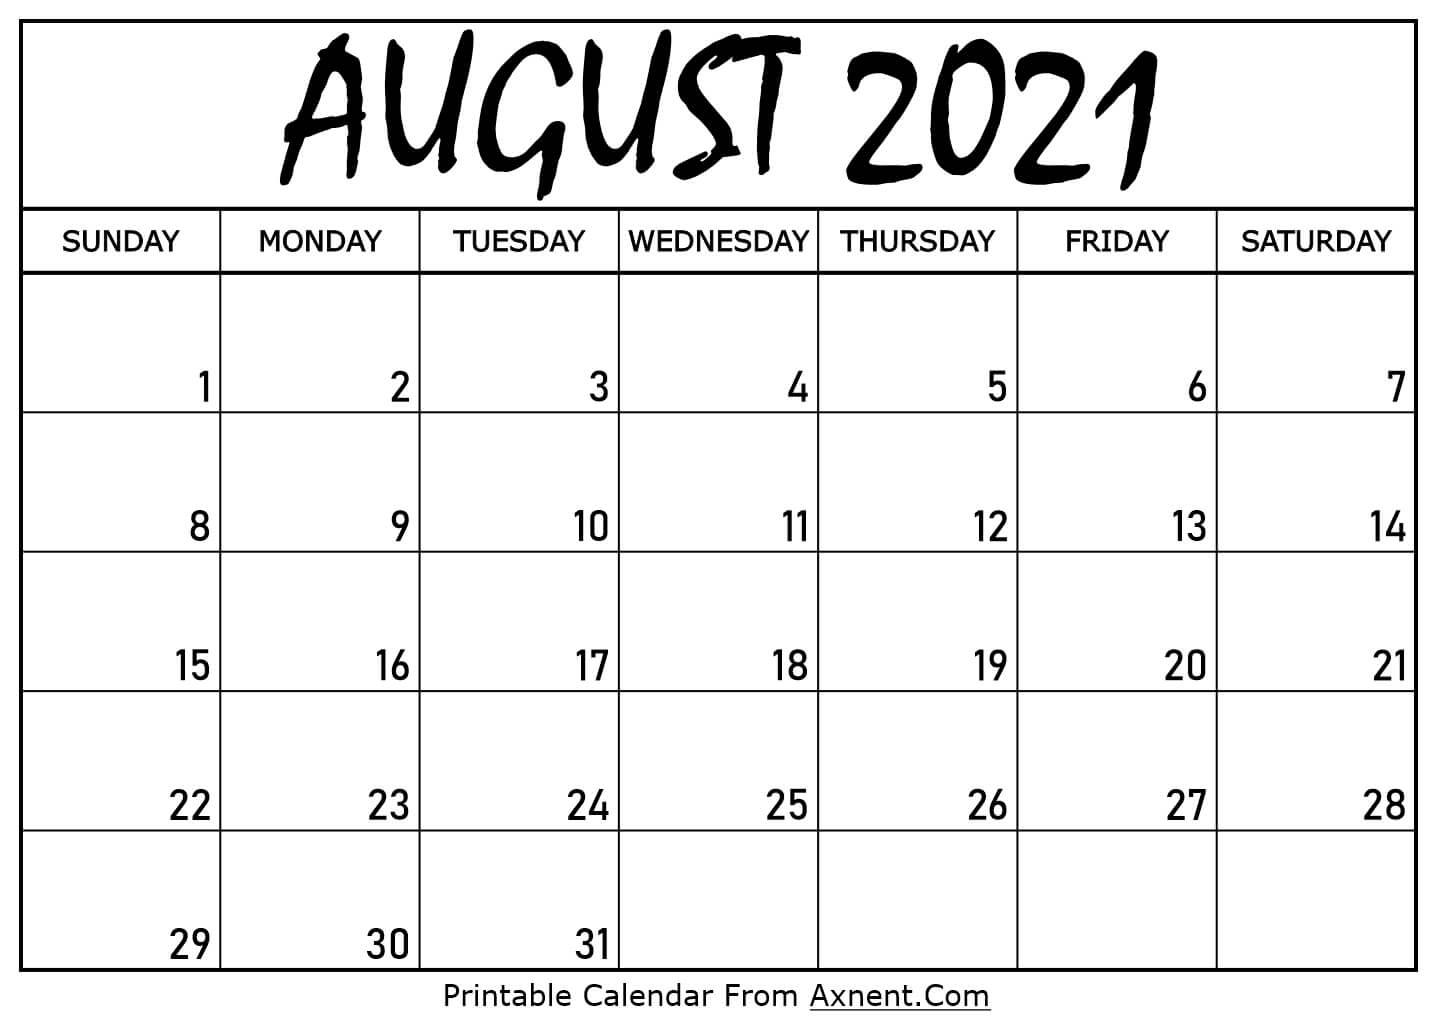 Printable August 2021 Calendar Template  Print Now within August 2021 Calendar Print